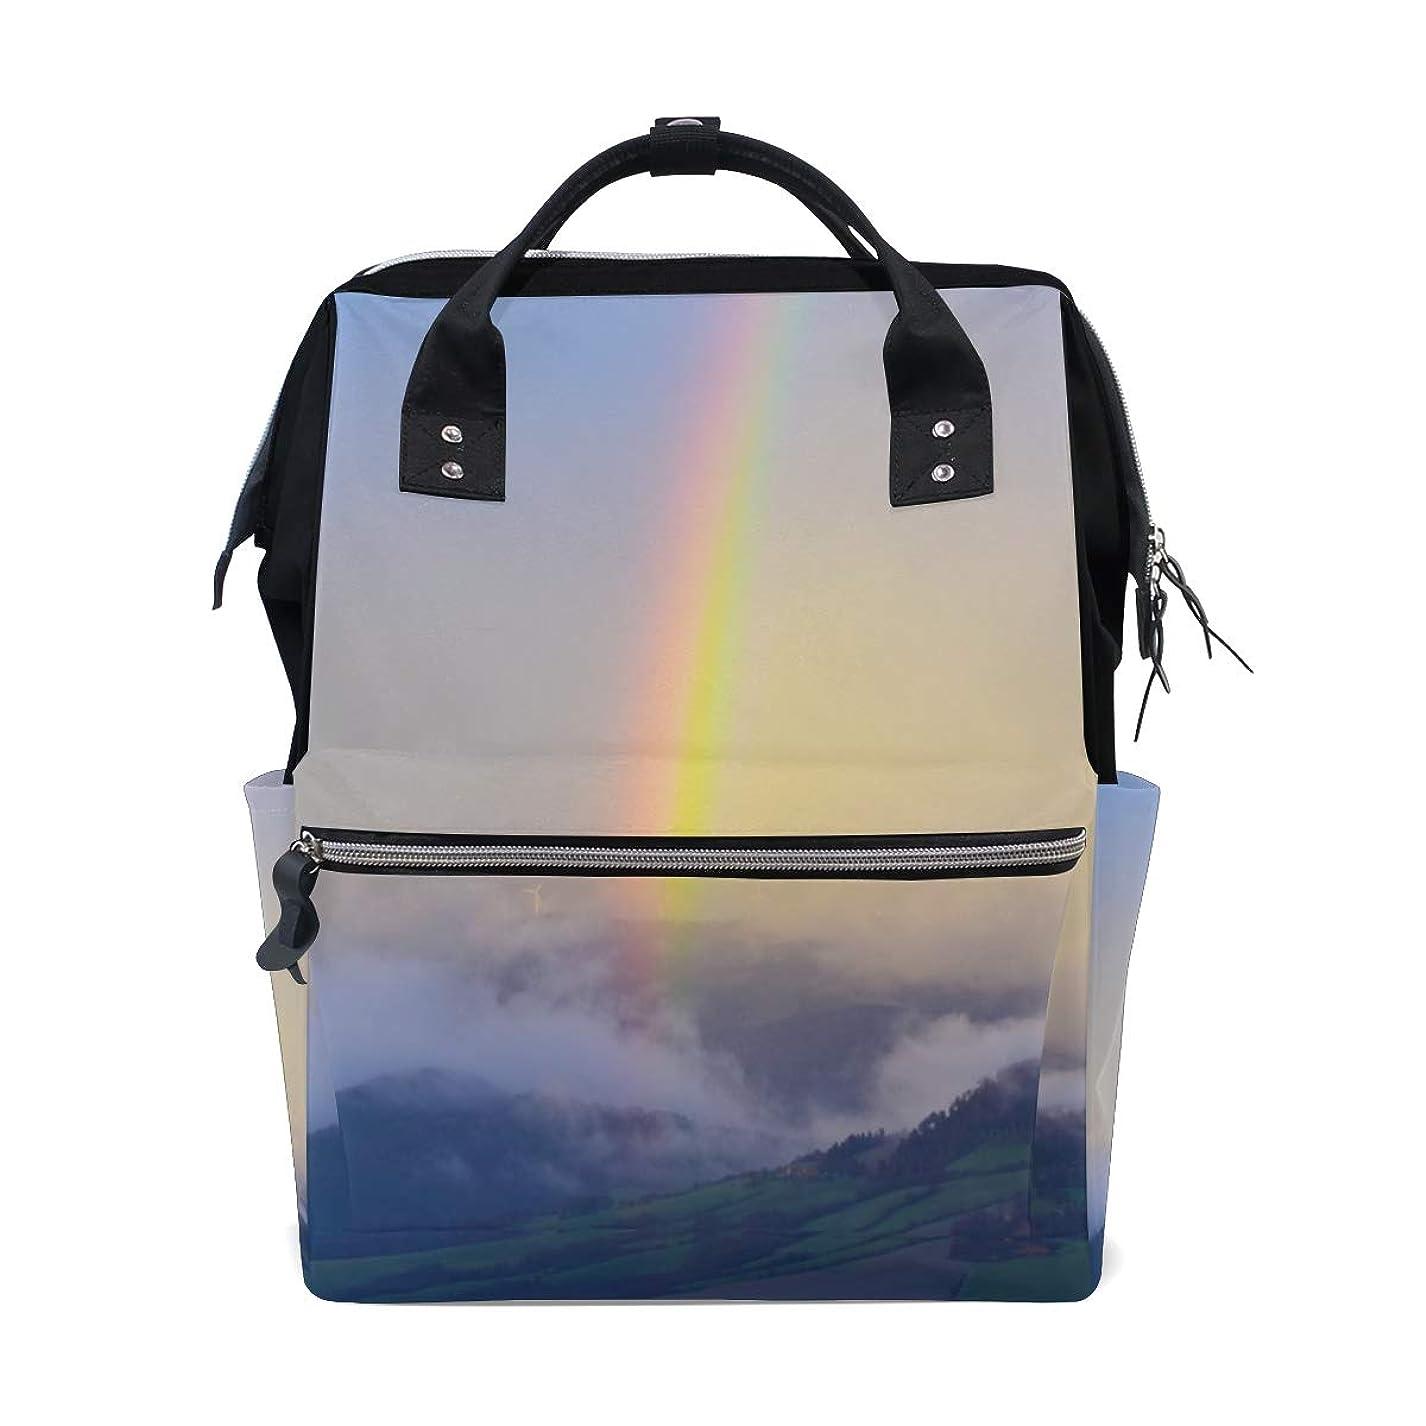 Backpack Landscape Field Mountain Rainbow School Rucksack Diaper Bags Travel Shoulder Large Capacity Bookbag for Women Men ots707440030922